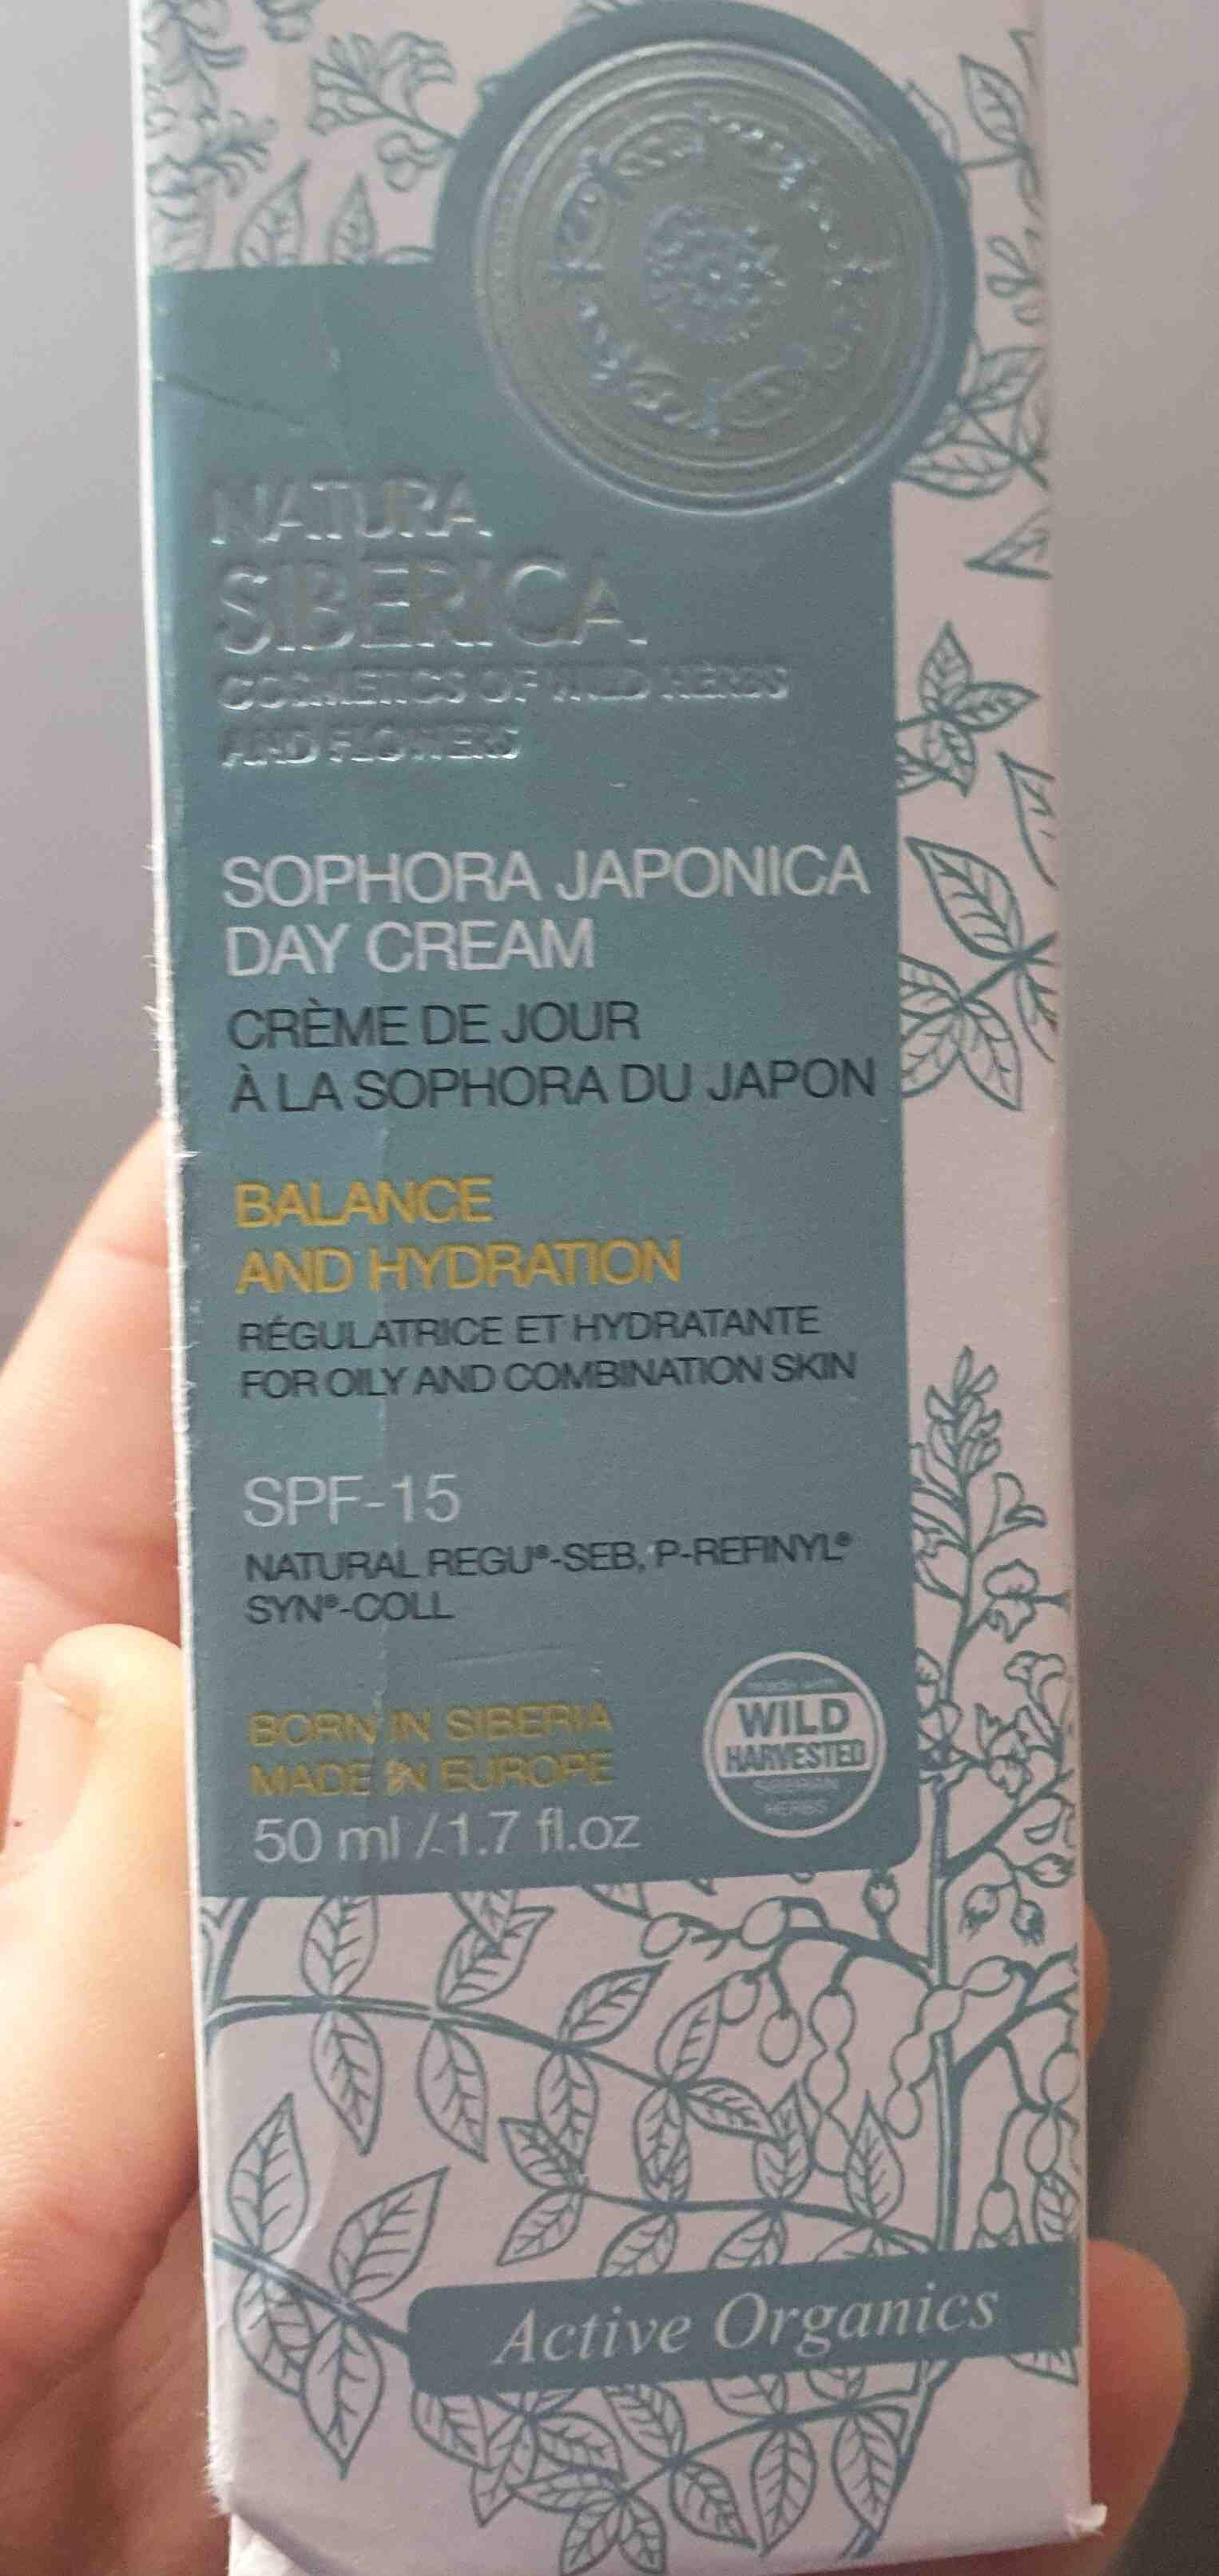 sophora japonica day cream - Product - en